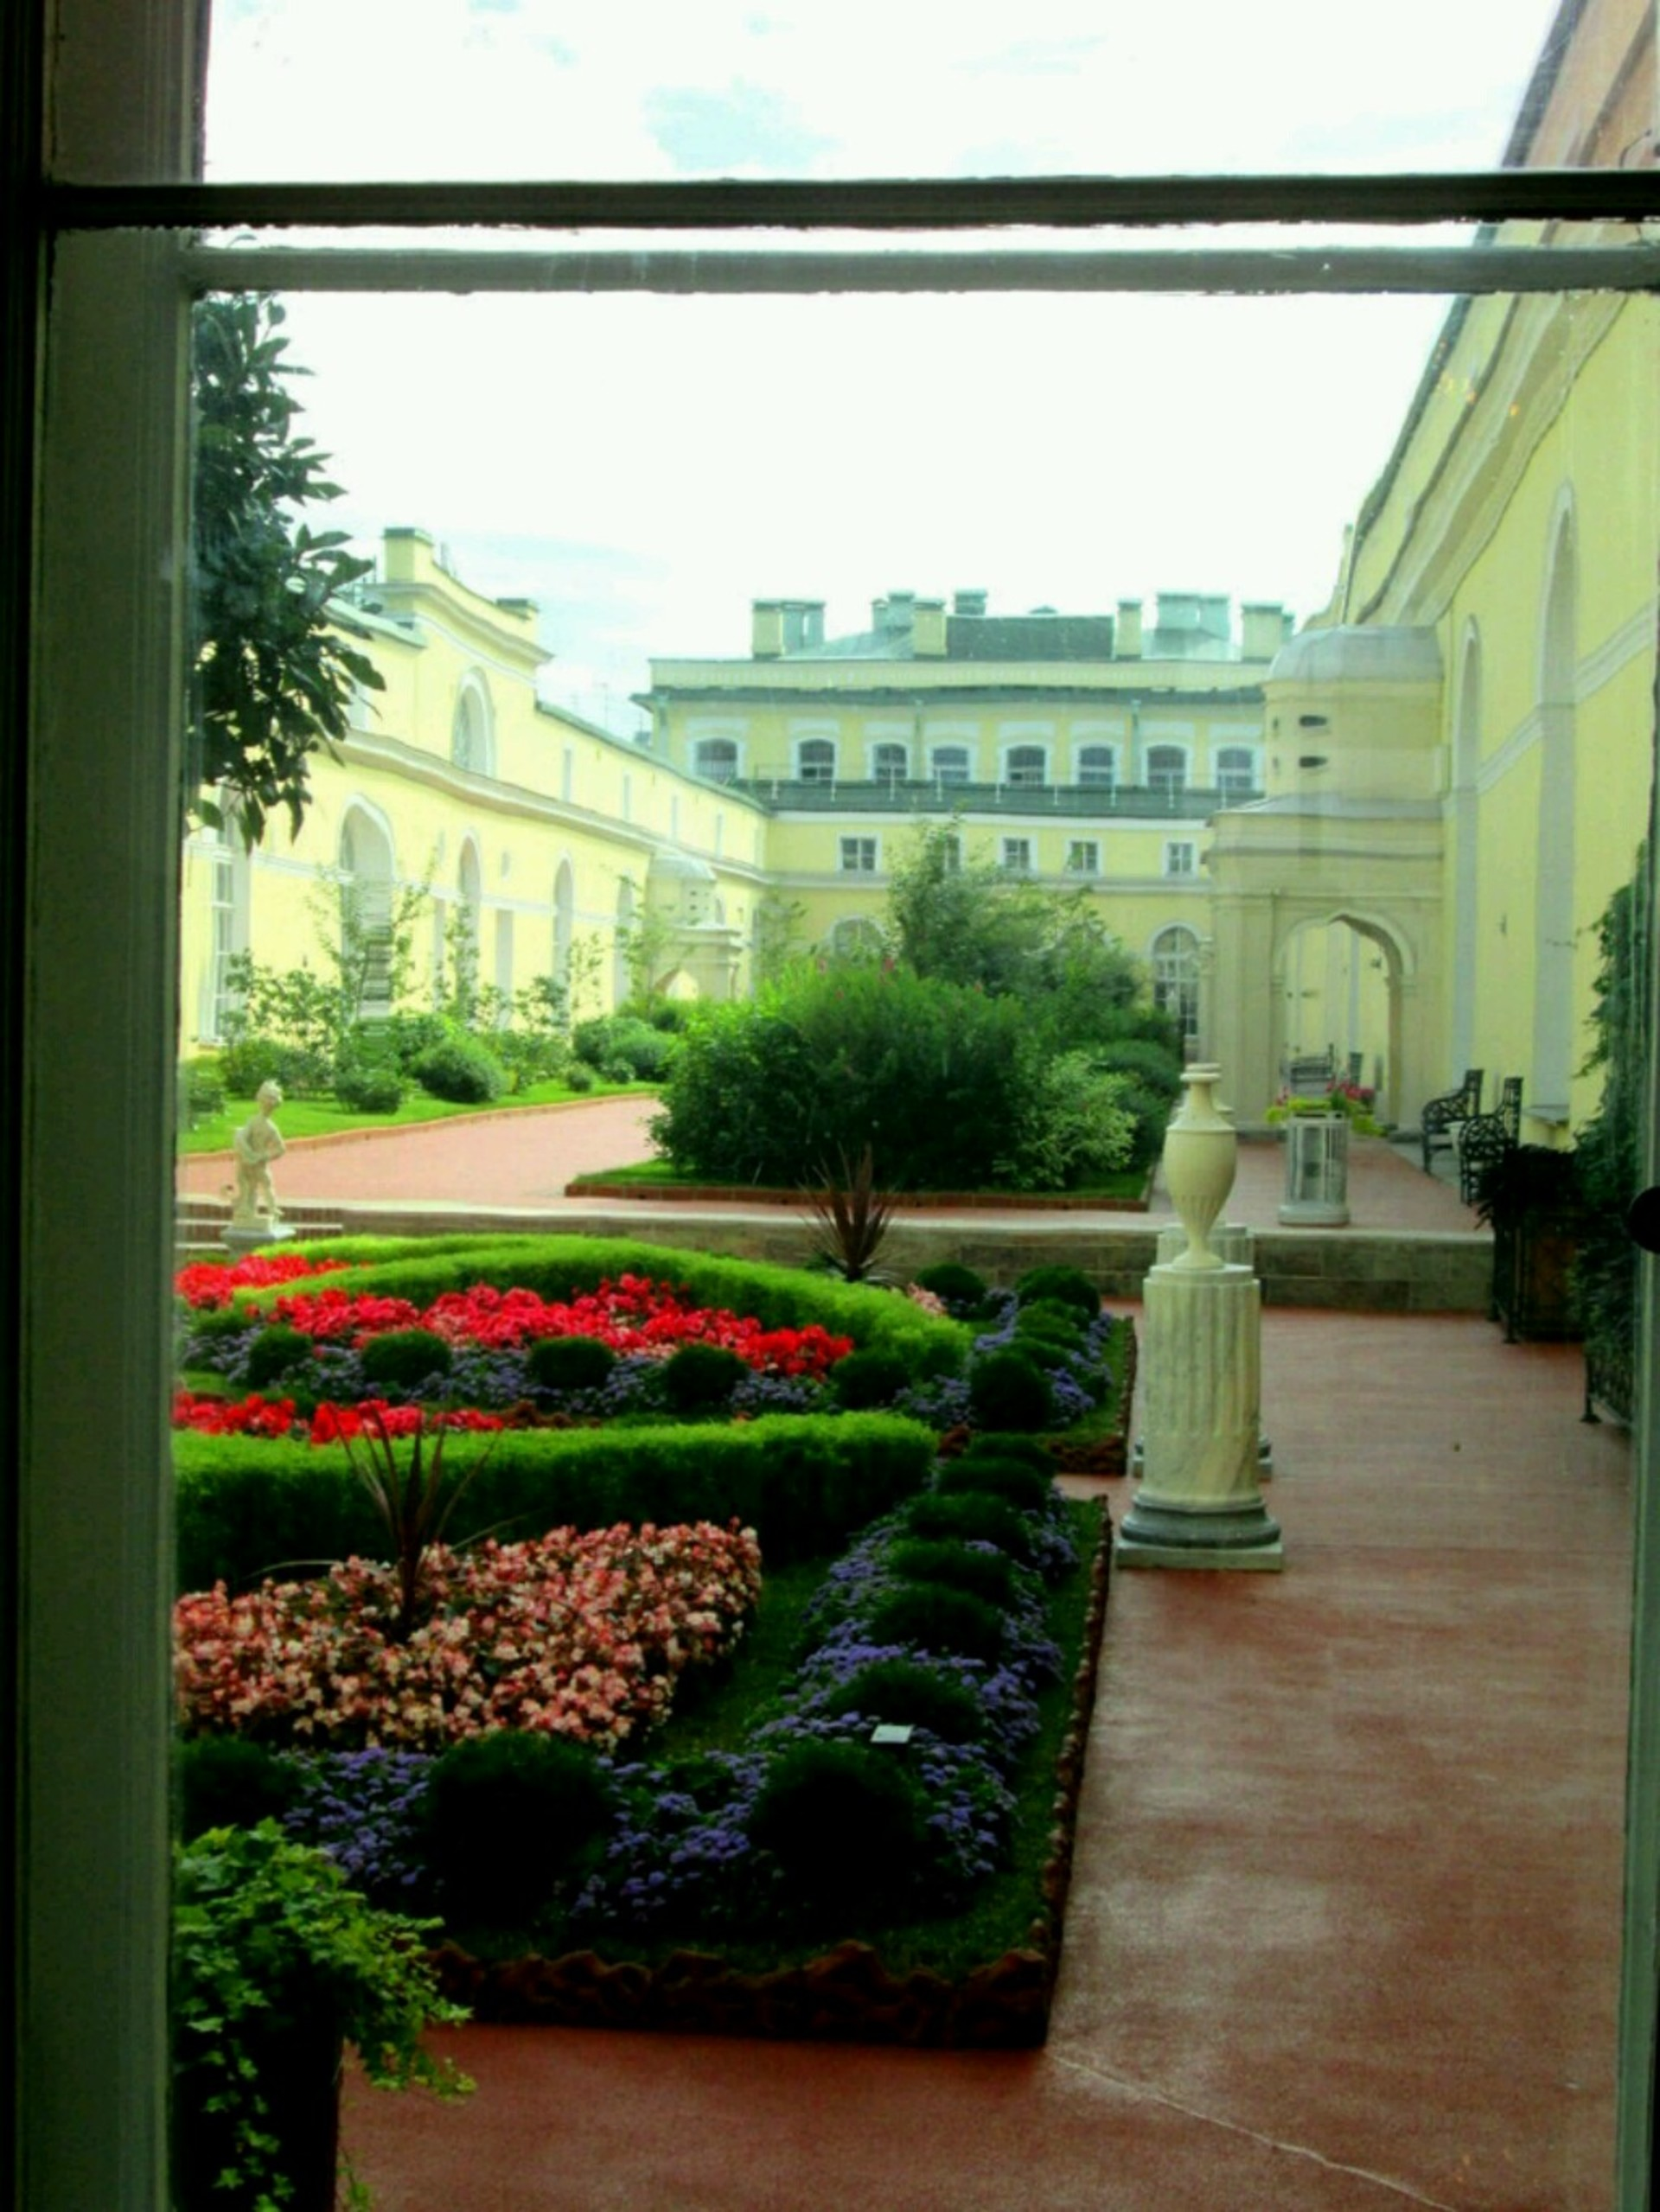 hermitage garden   nbraver100, flowers, palace, museum